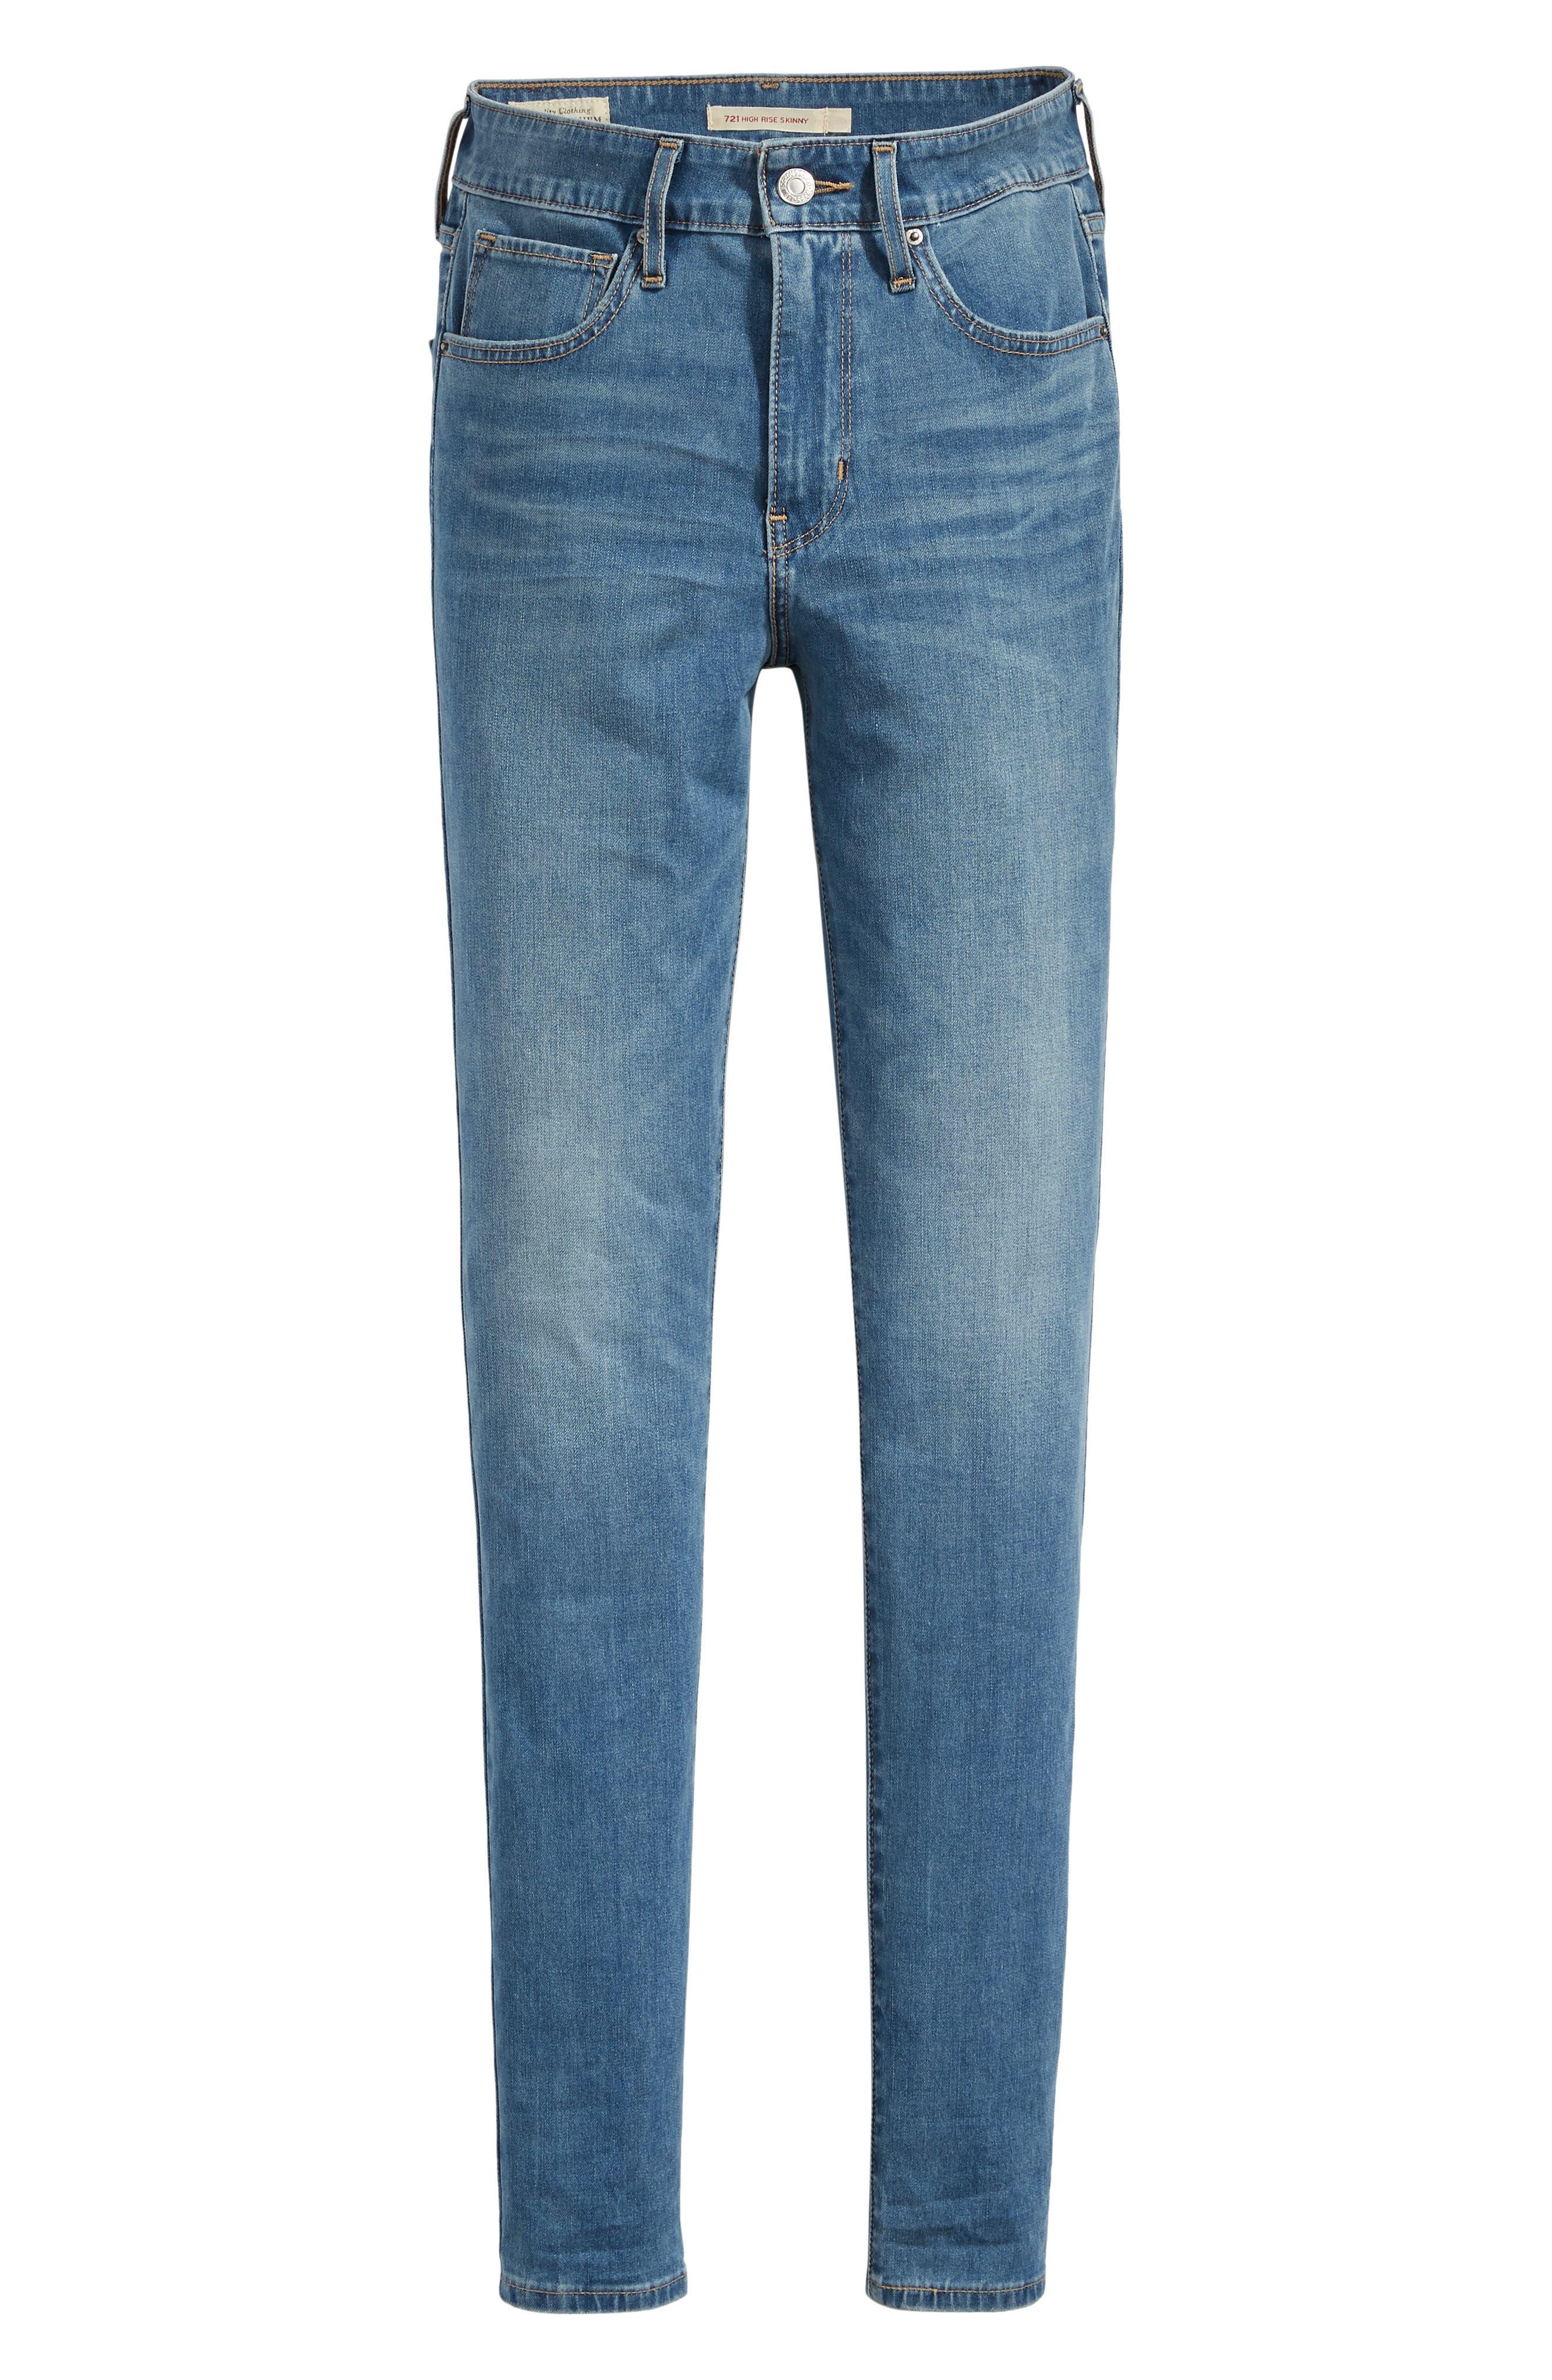 LEVI'S<SUP>®</SUP>,                             721<sup>™</sup> High Waist Skinny Jeans,                             Alternate thumbnail 5, color,                             L.O.L.